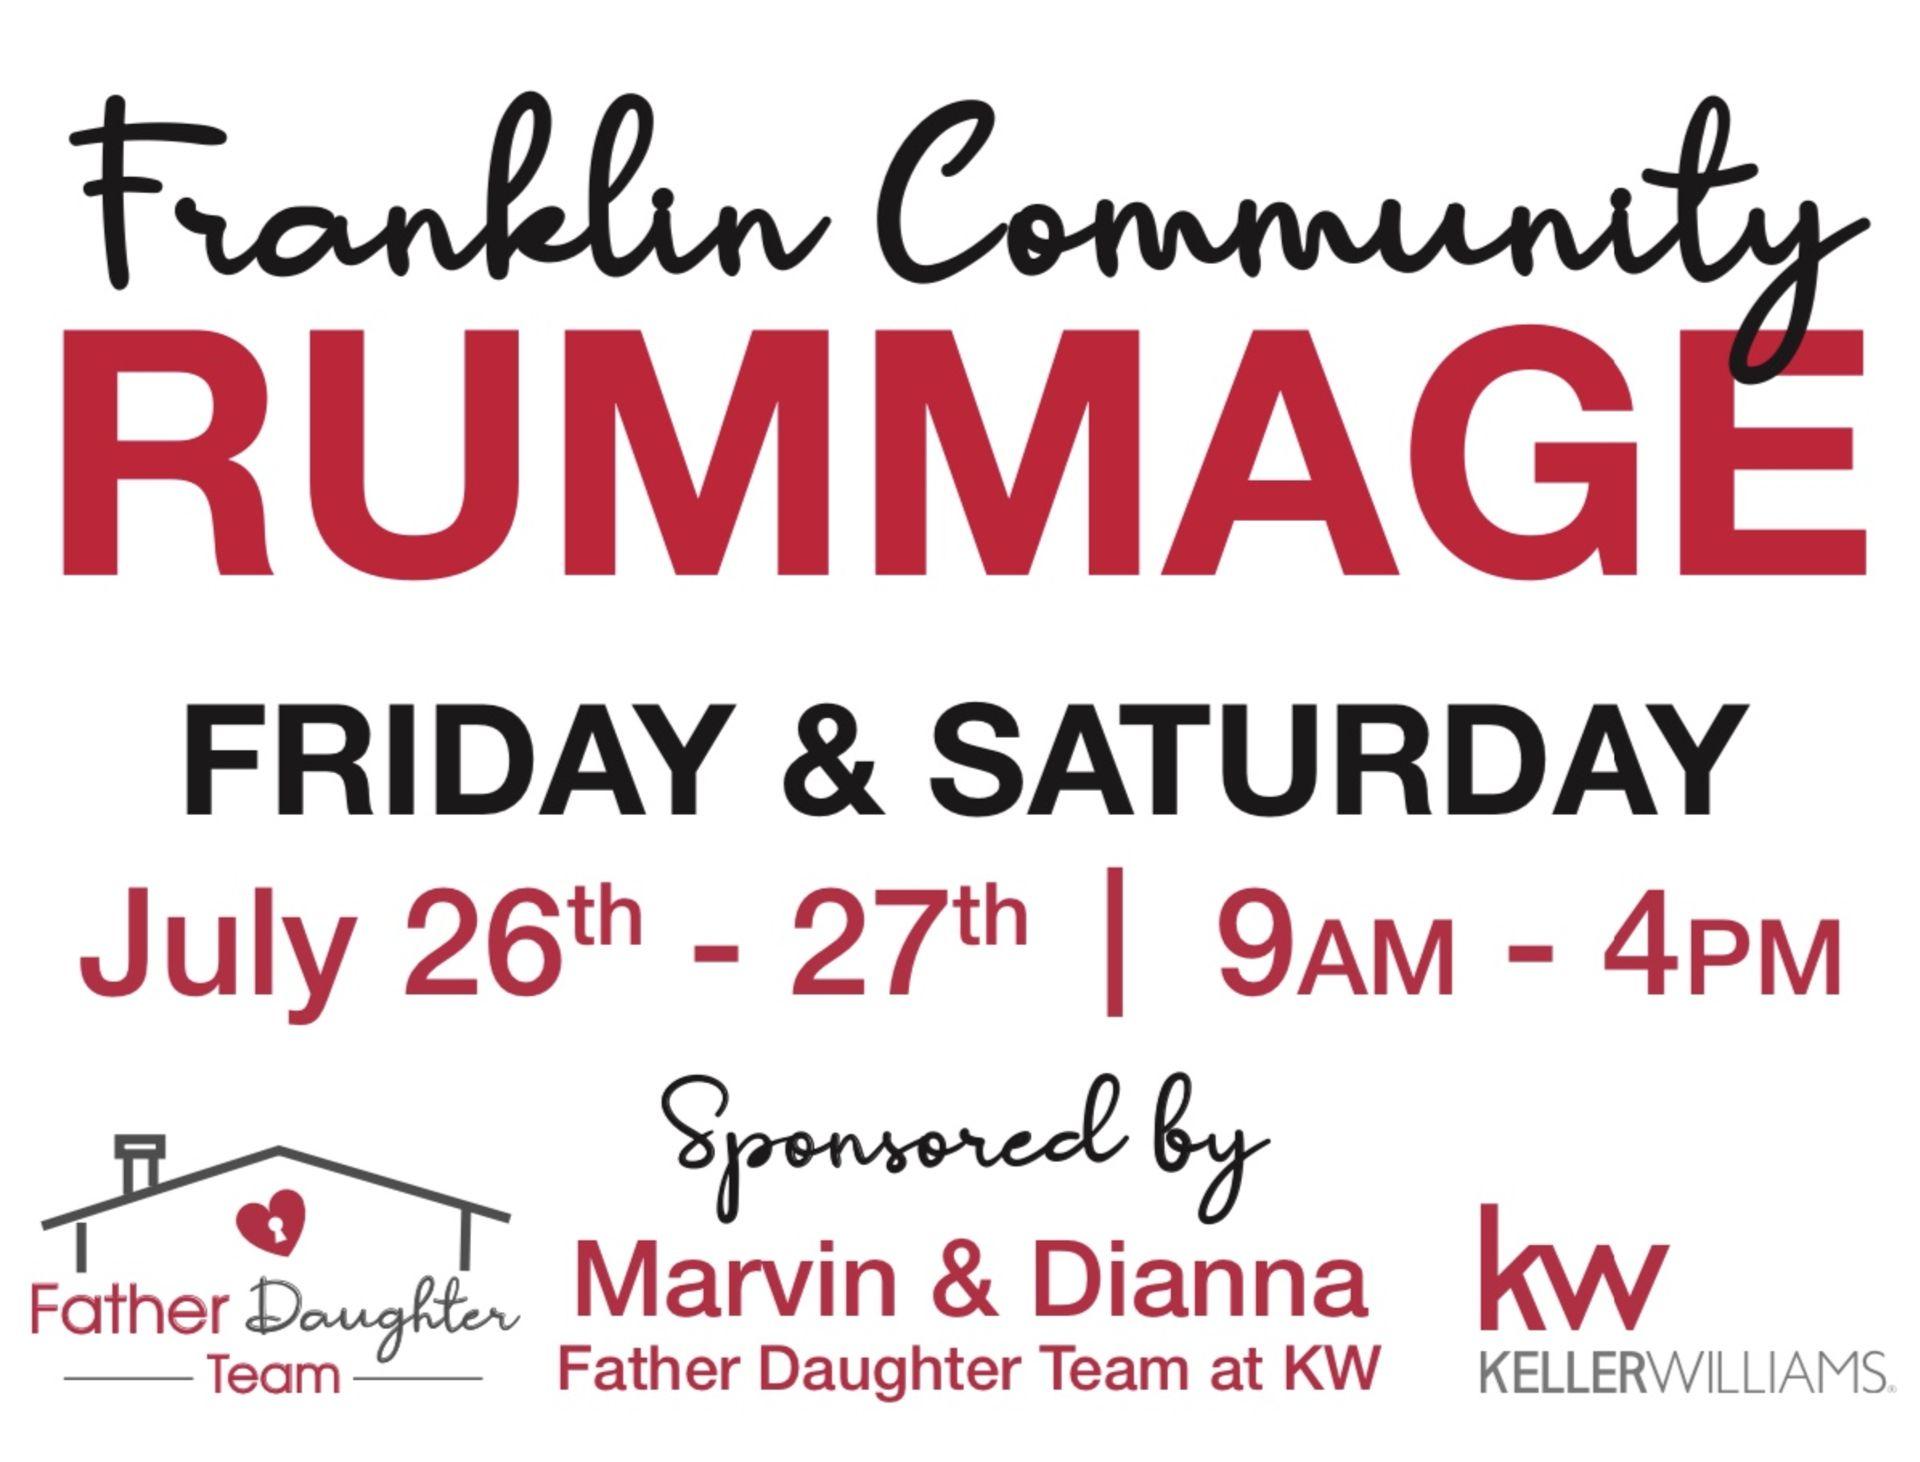 Franklin Community Rummage Sale! July 26th -27th